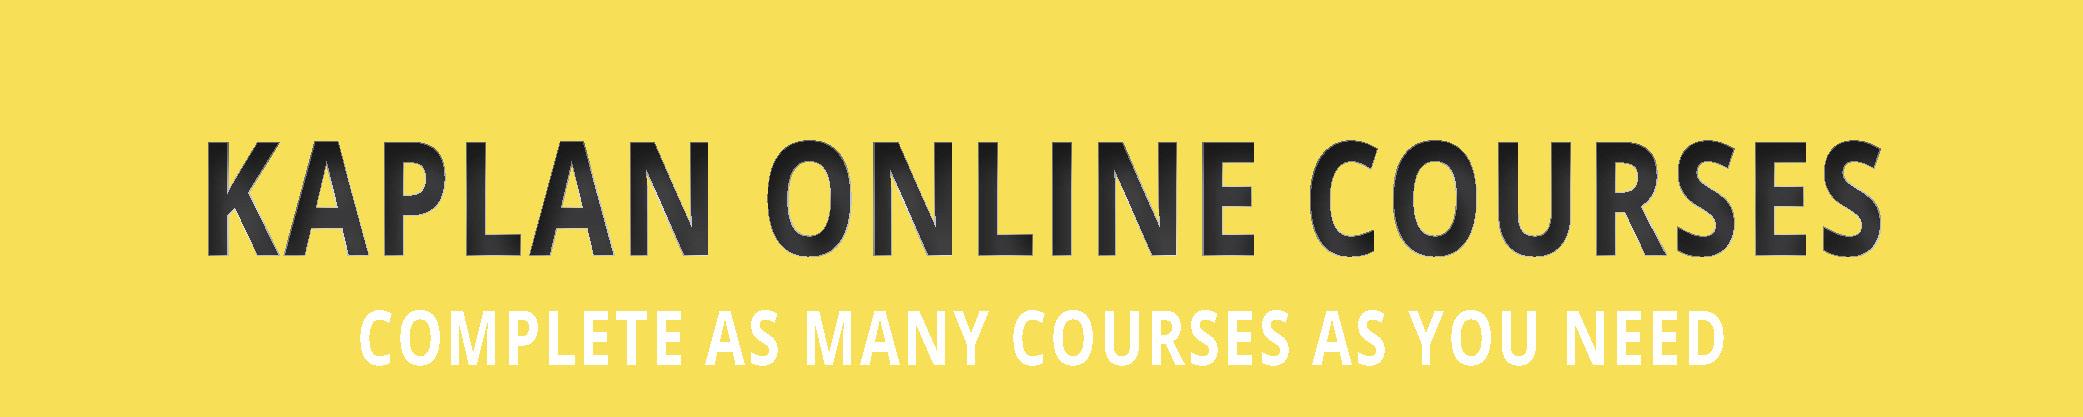 Kaplan Online Courses